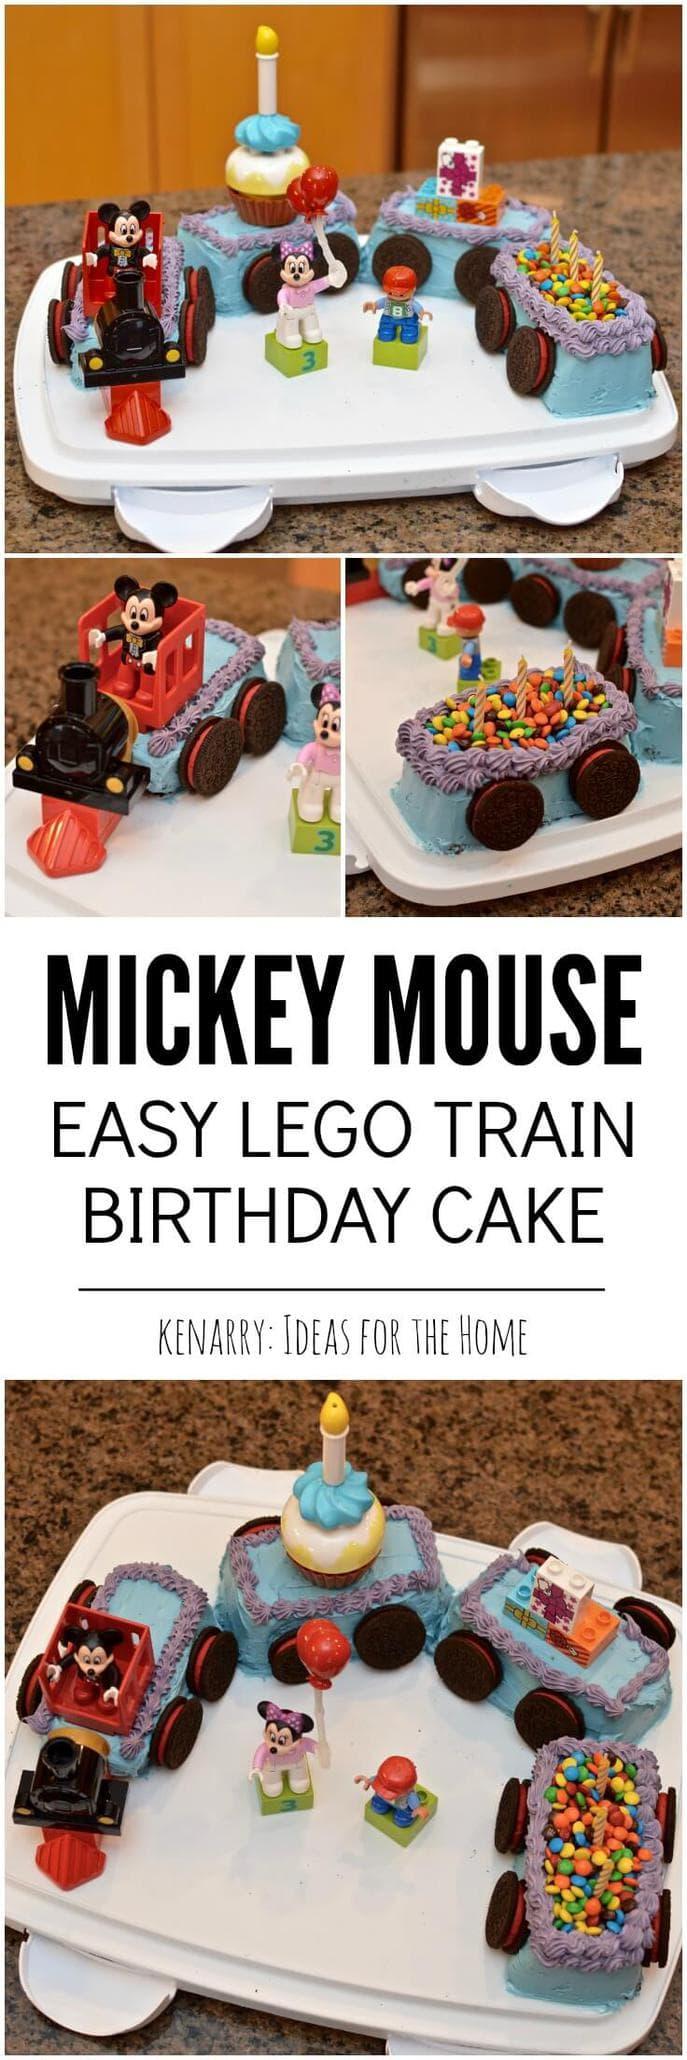 mickey mouse cake an easy birthday idea on chocolate train birthday cake recipe